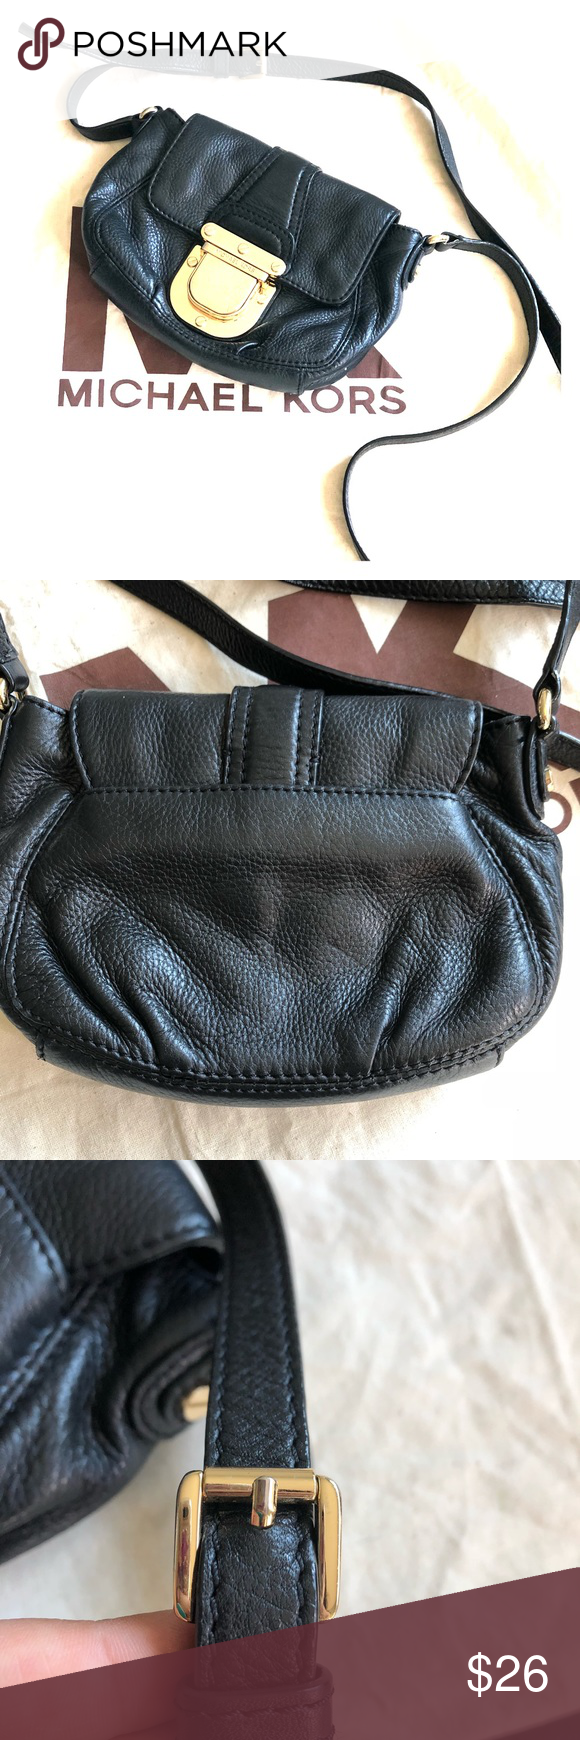 b215c51be02e Spotted while shopping on Poshmark  SOLD-Michael Kors Charlton Crossbody  Bag!  poshmark  fashion  shopping  style  MICHAEL Michael Kors  Handbags